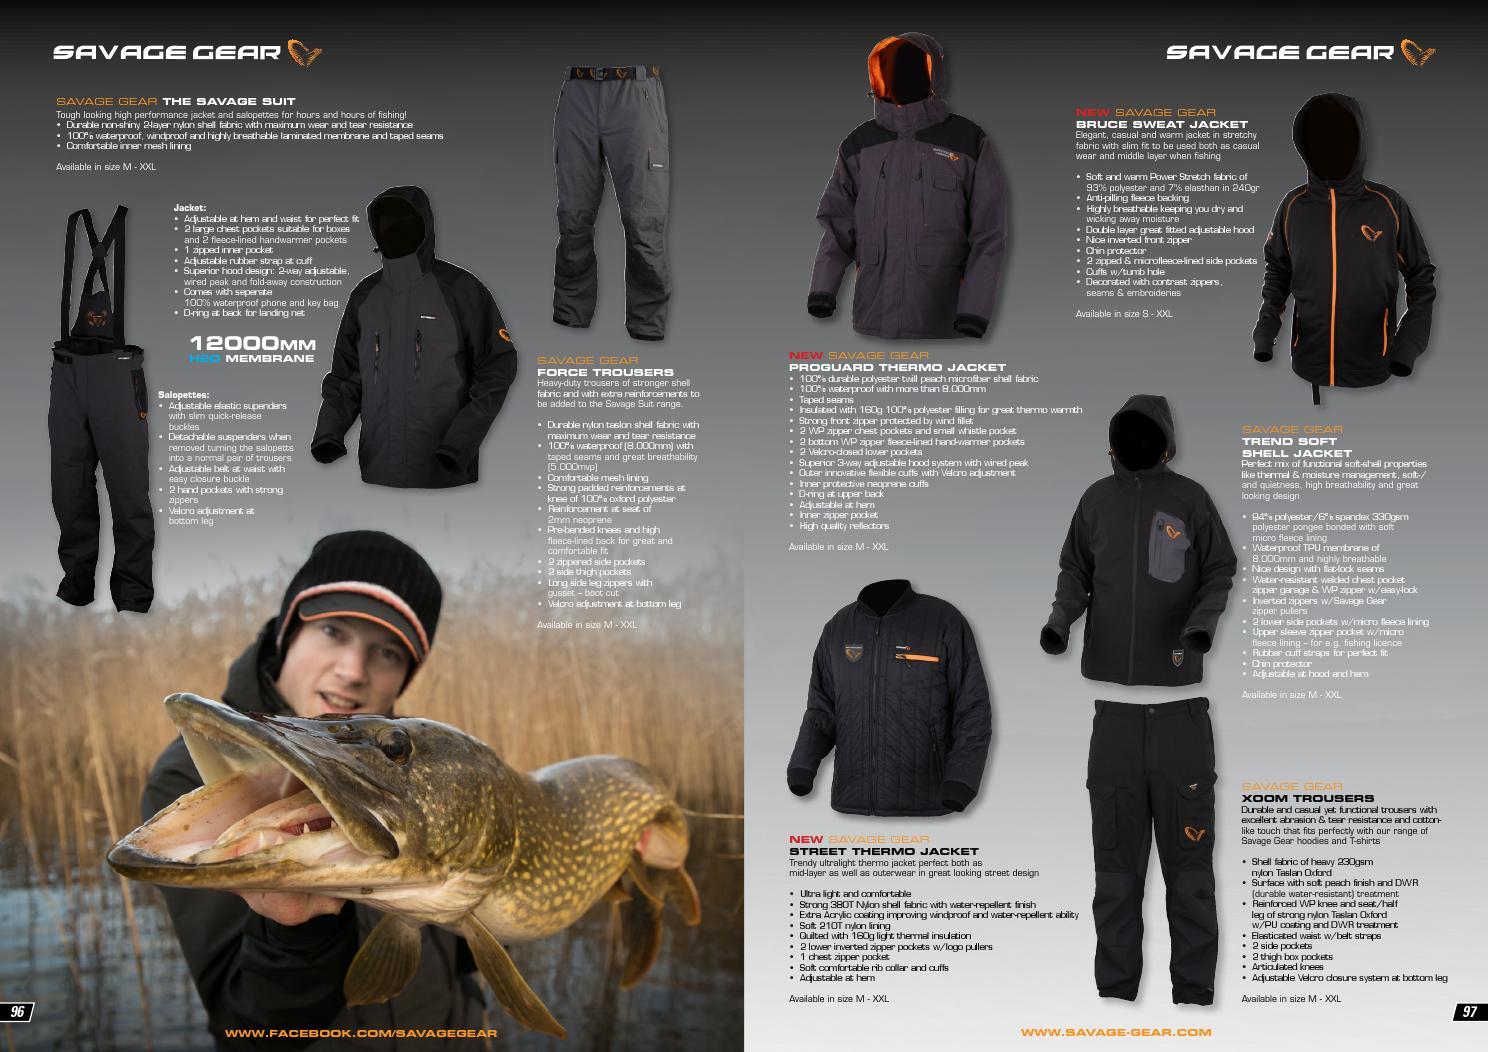 Savage Gear Jacket Proguard Thermo M-XXL Durable Waterproof